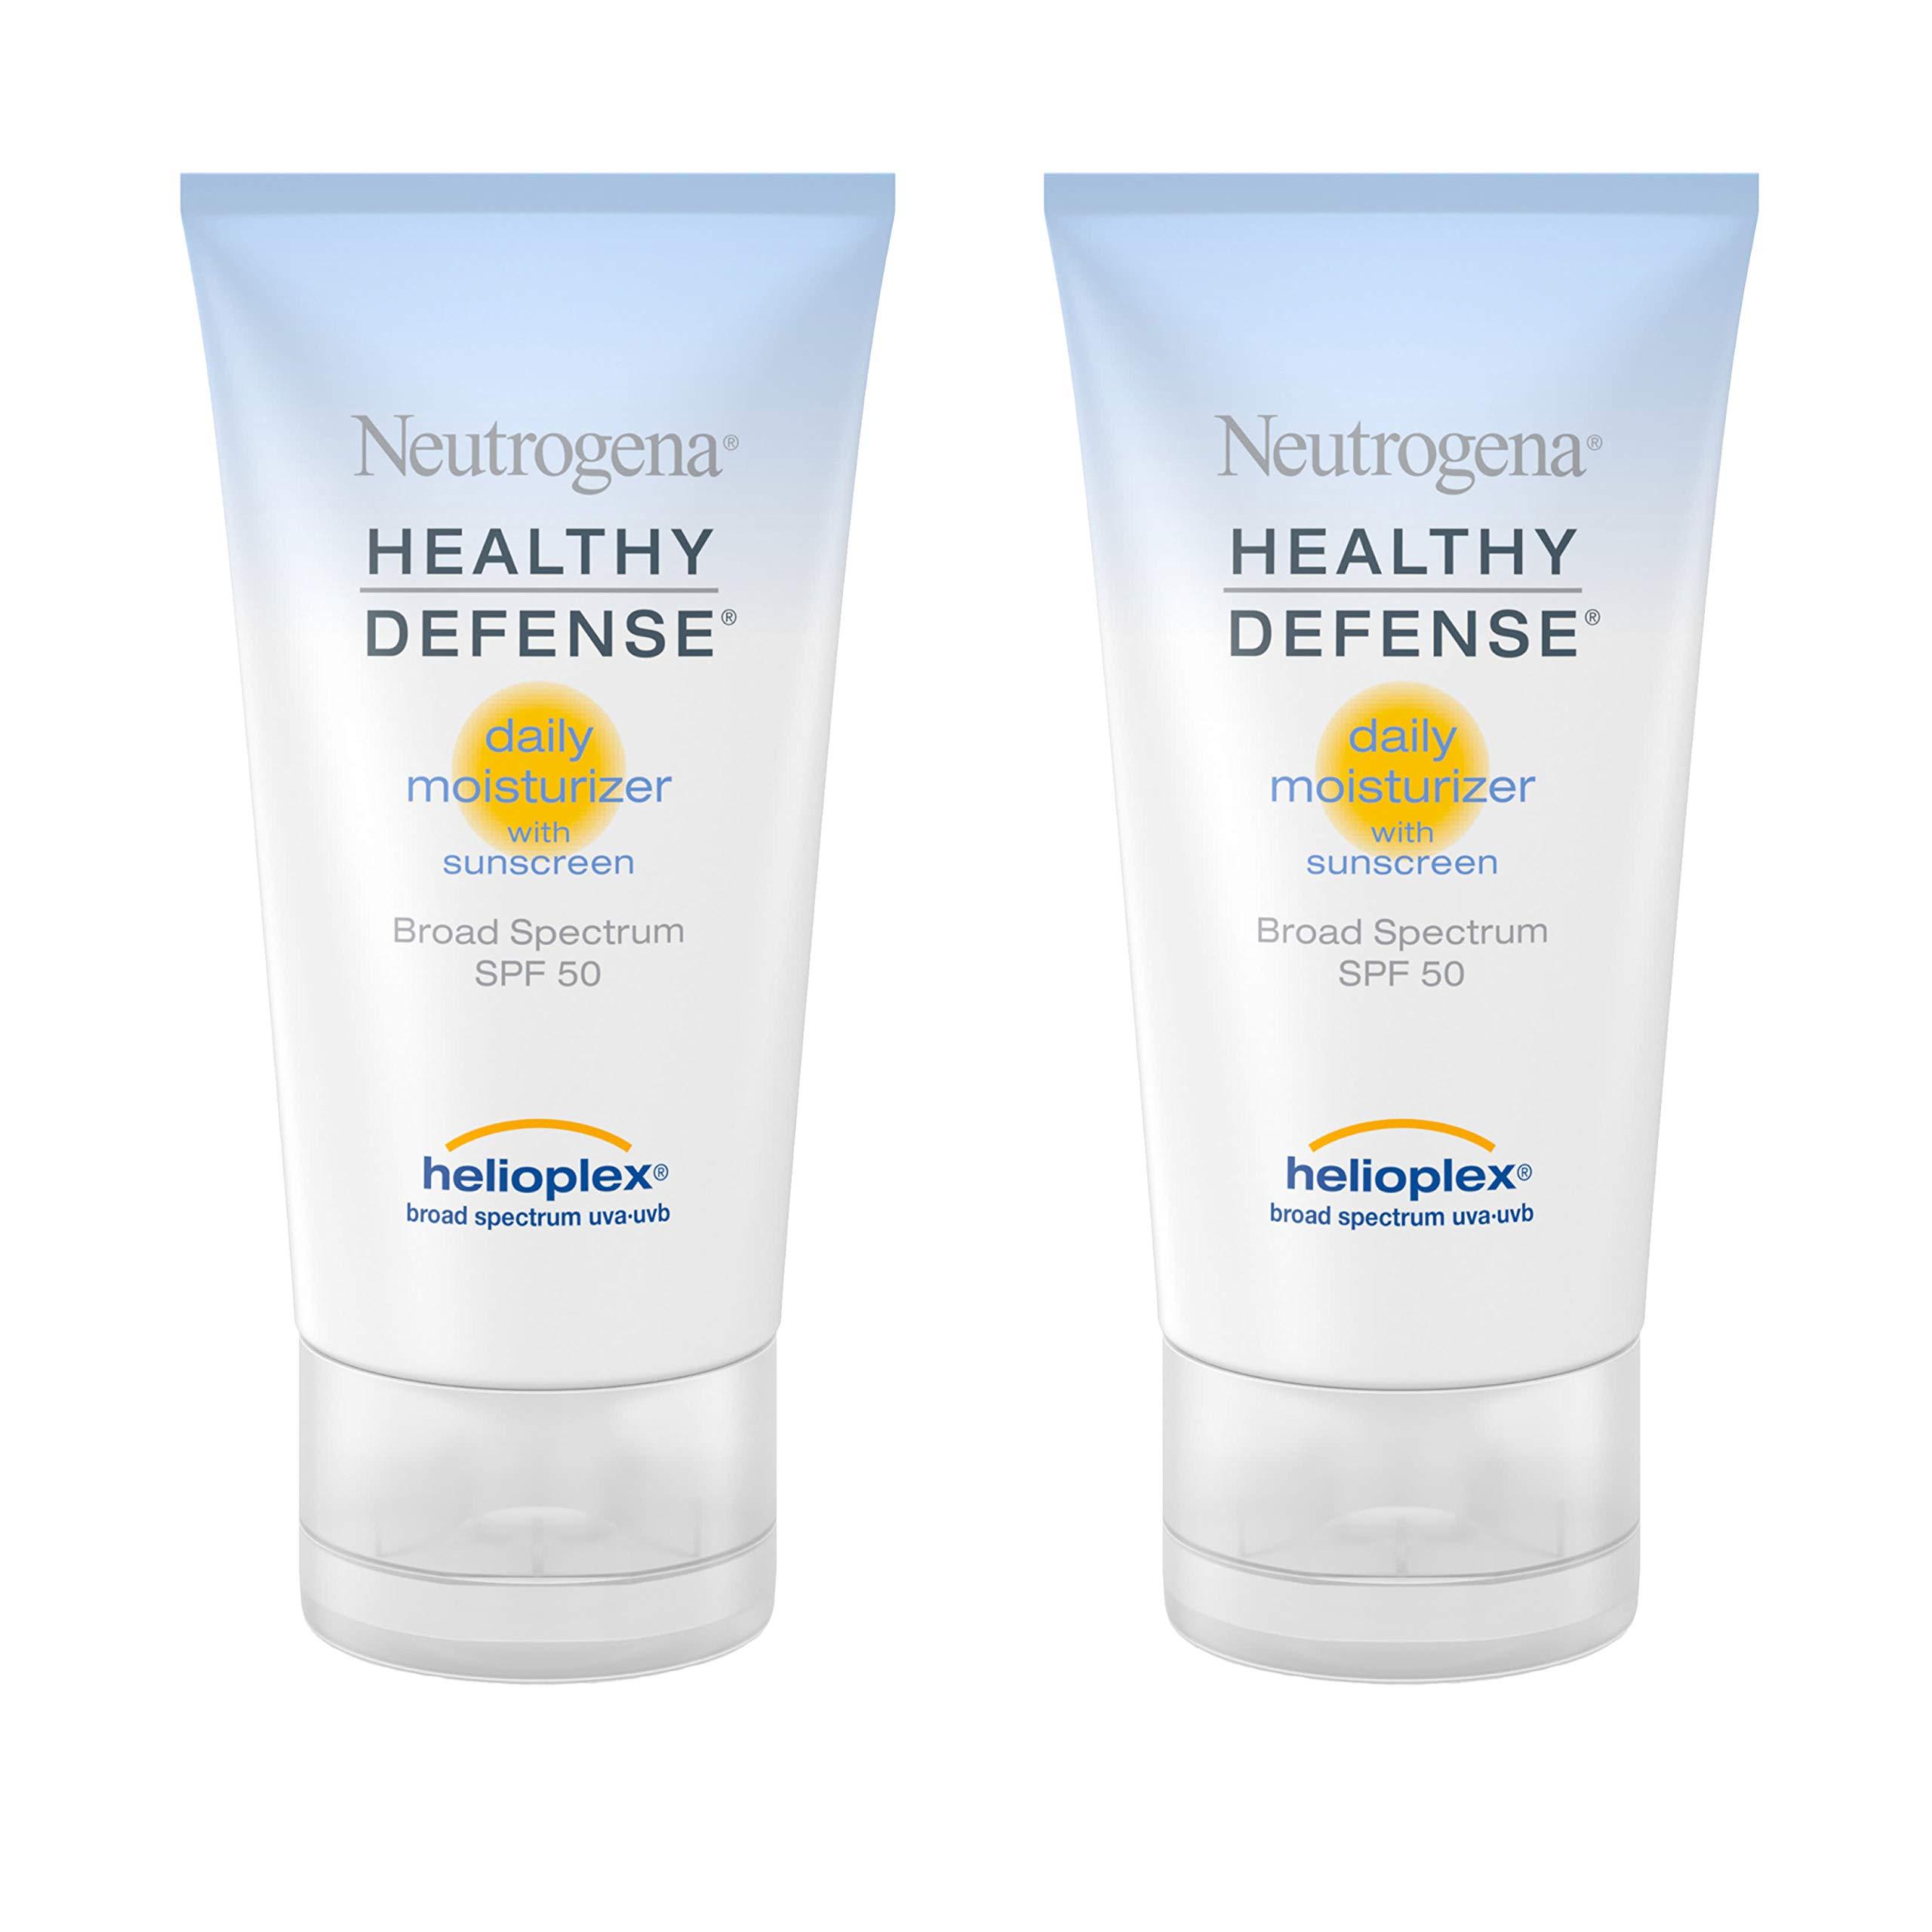 Neutrogena Healthy Defense Daily Moisturizer with Broad Spectrum SPF 50 Sunscreen, Vitamin E & Anti-Oxidants, Lightweight, Non-Greasy & Hypoallergenic, 1.7 fl. oz (Pack of 2)